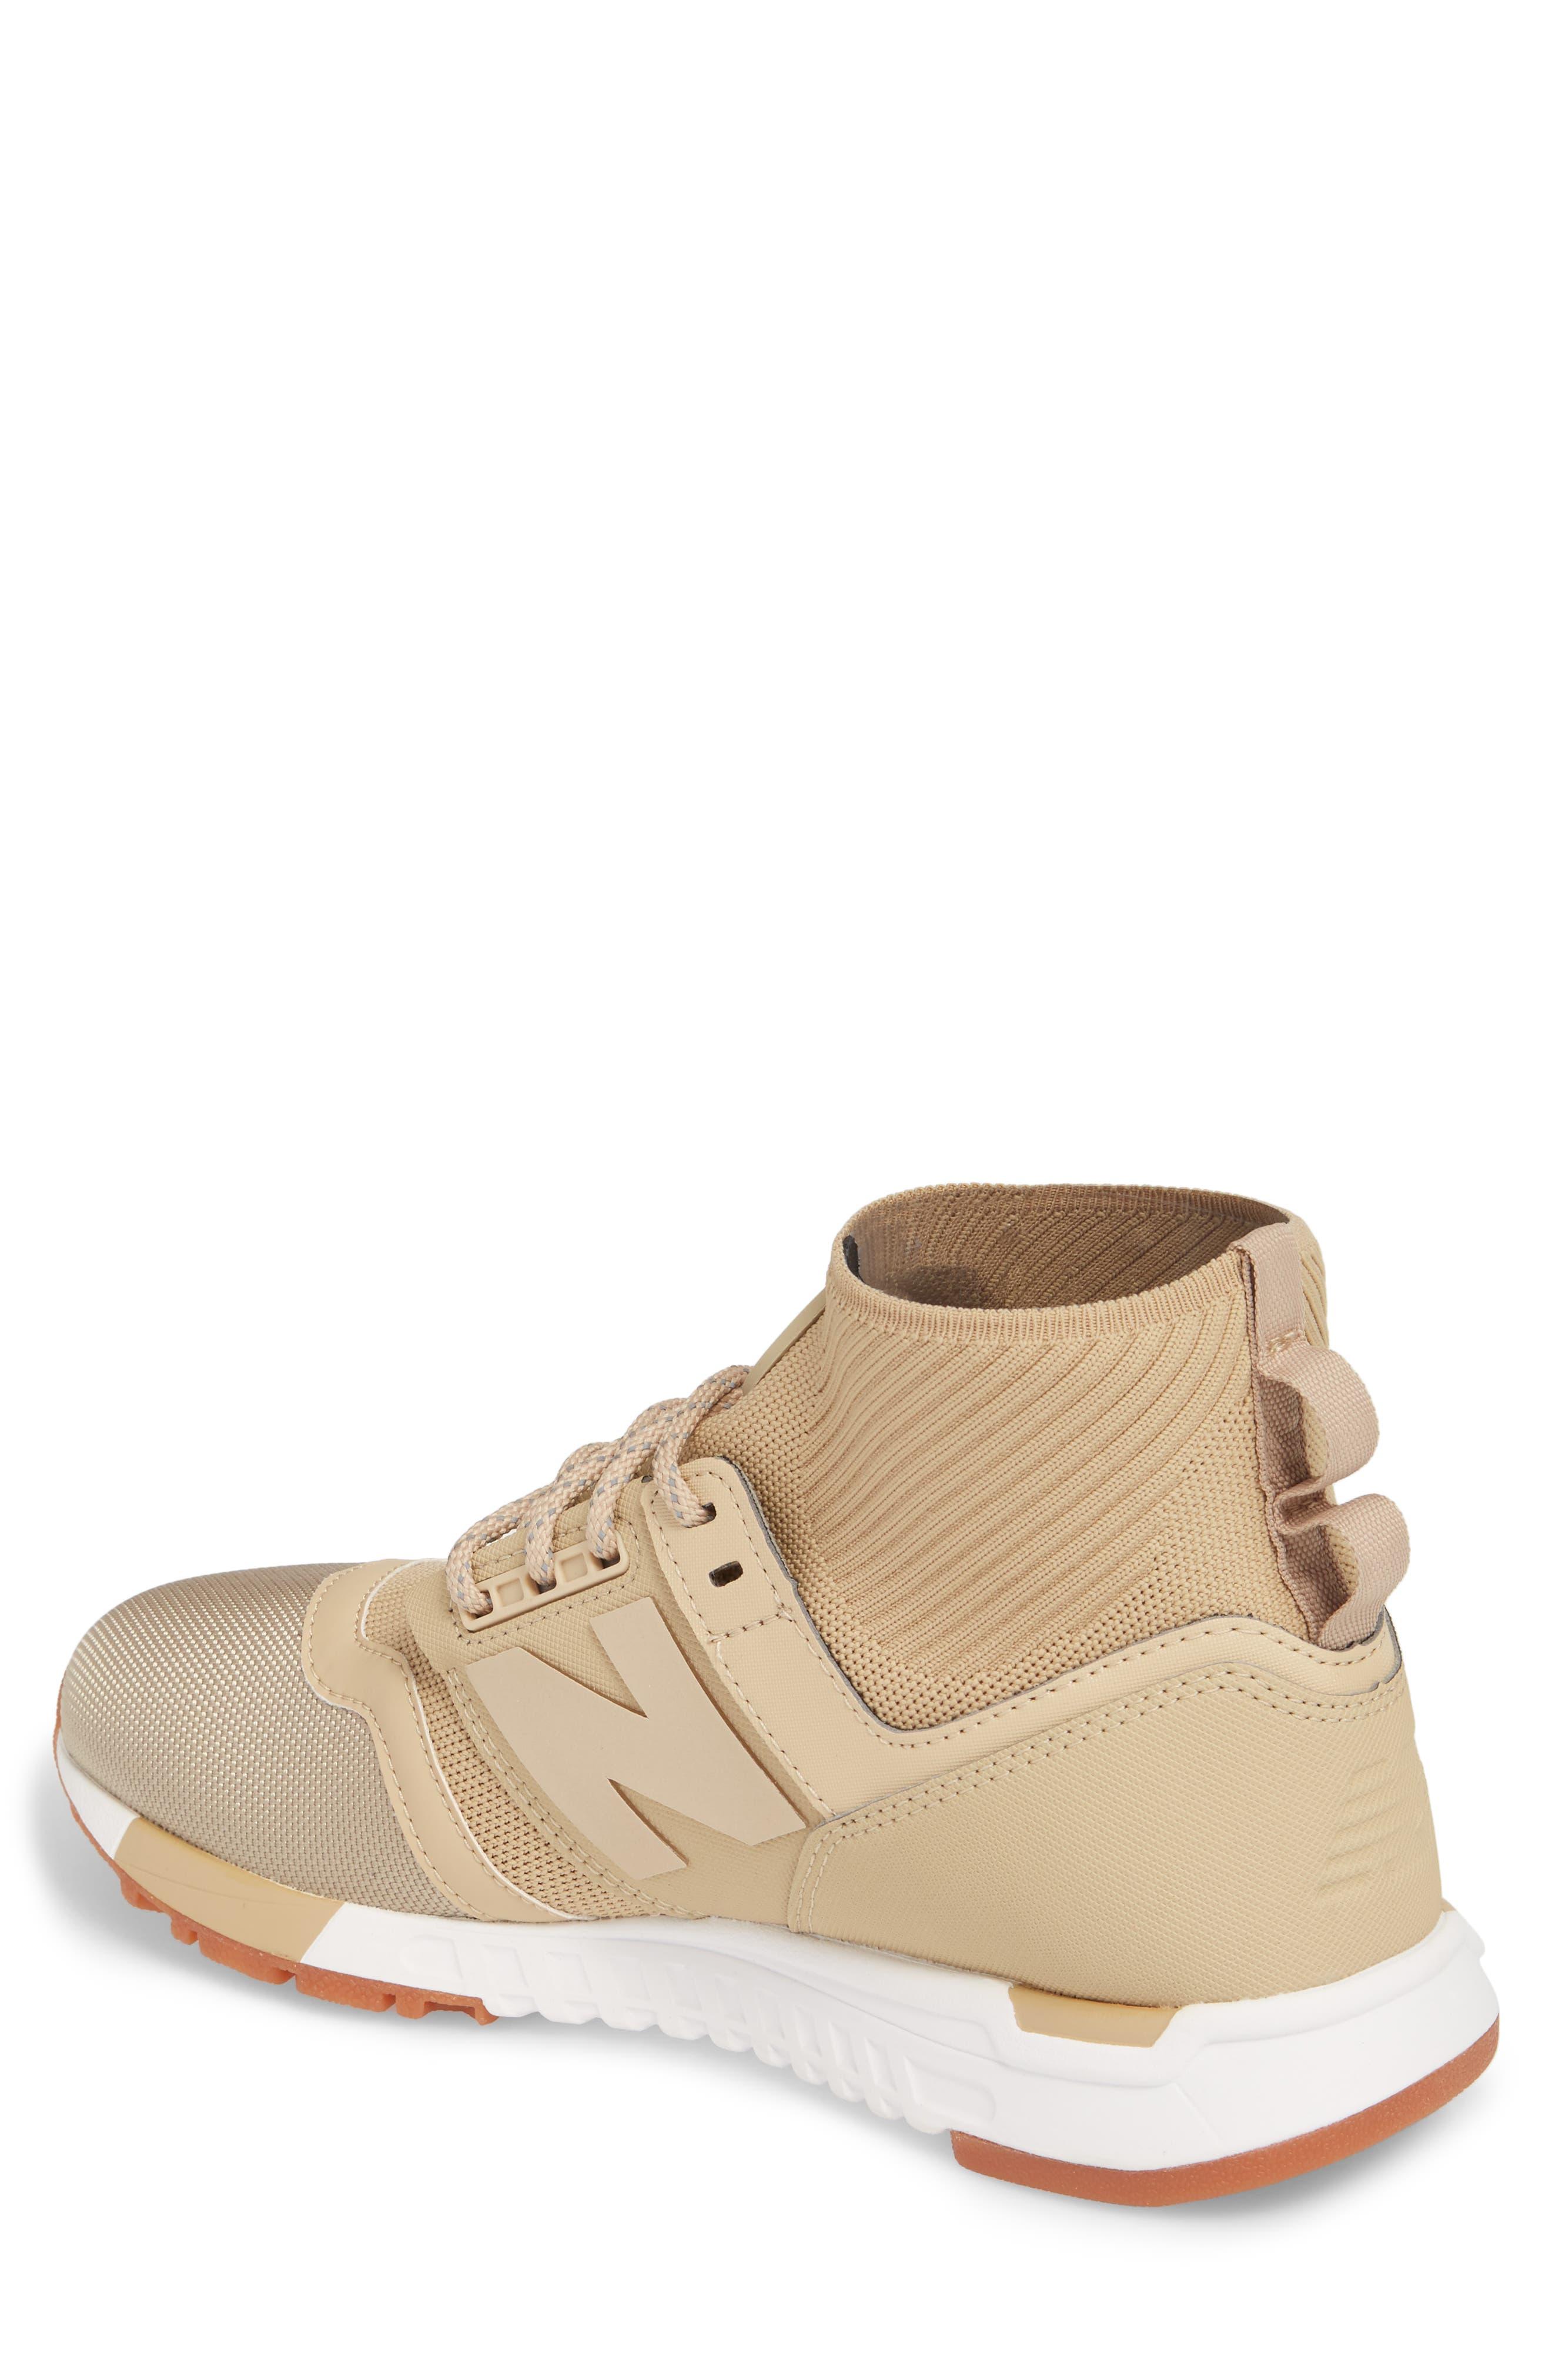 247 Mid Sneaker,                             Alternate thumbnail 7, color,